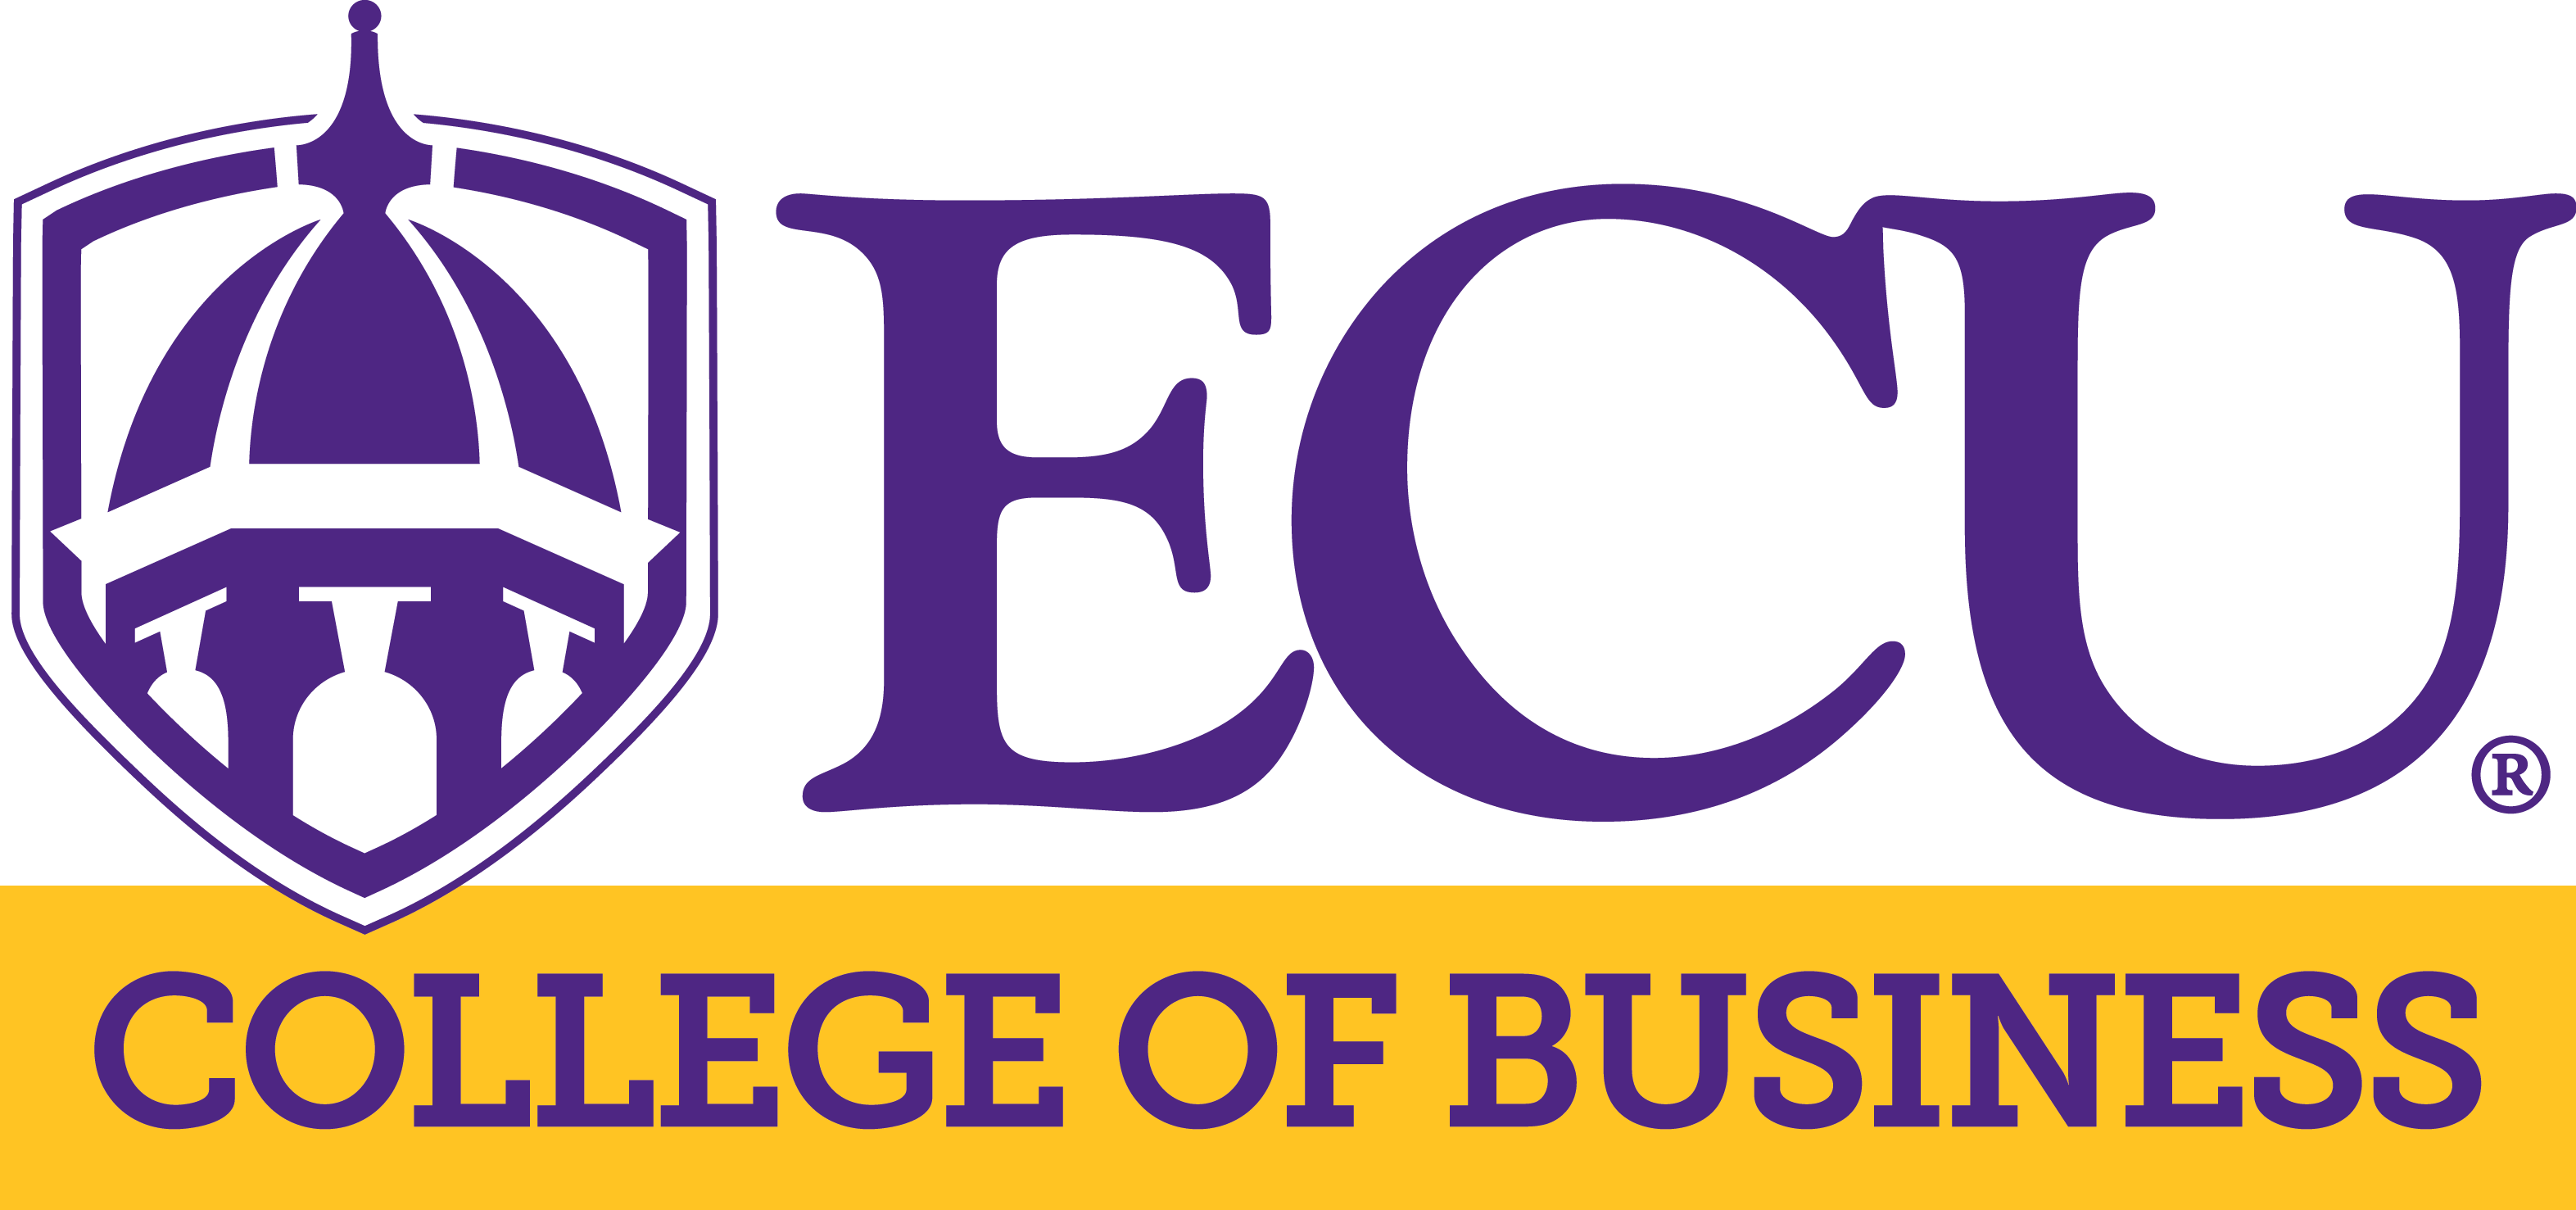 Paul Russell - East Carolina University - Director of